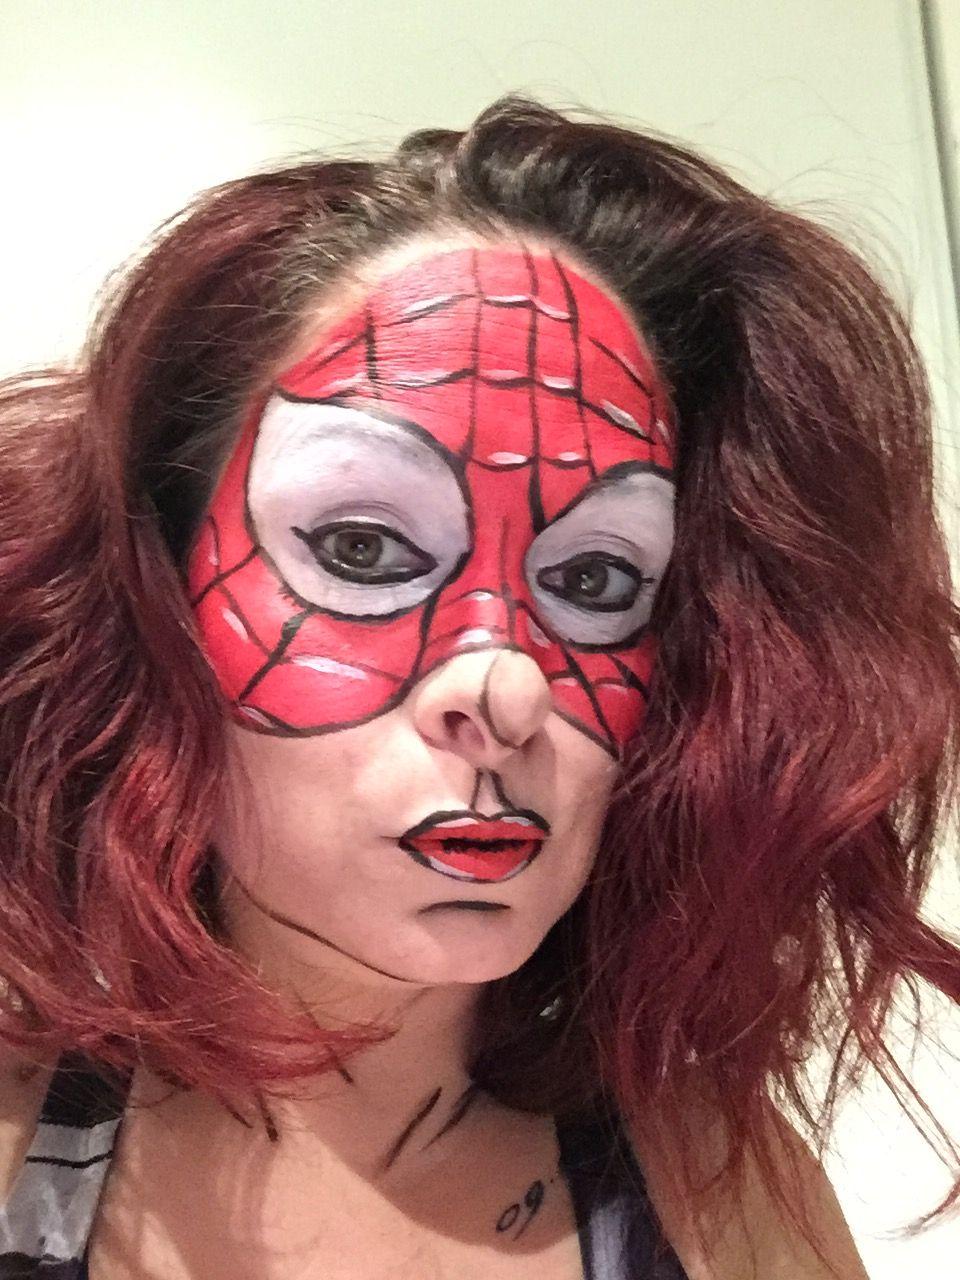 Spiderman | Maquillage professionnel, Maquillage